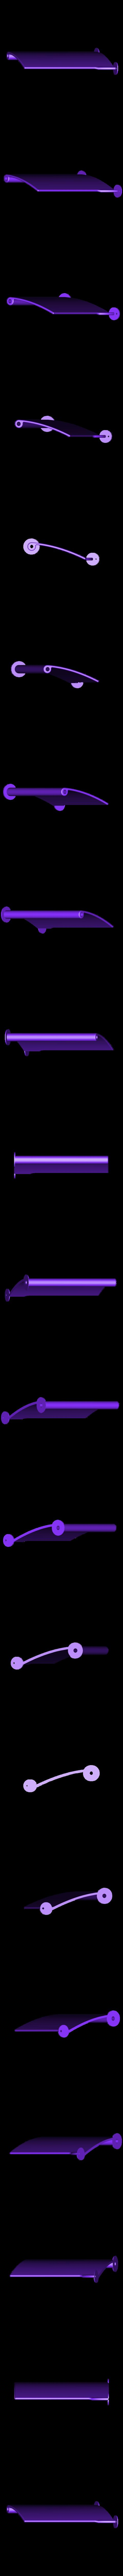 Printer_Cap_R.STL Download free STL file Table Organizer - Hand Printer • 3D print design, KuKu